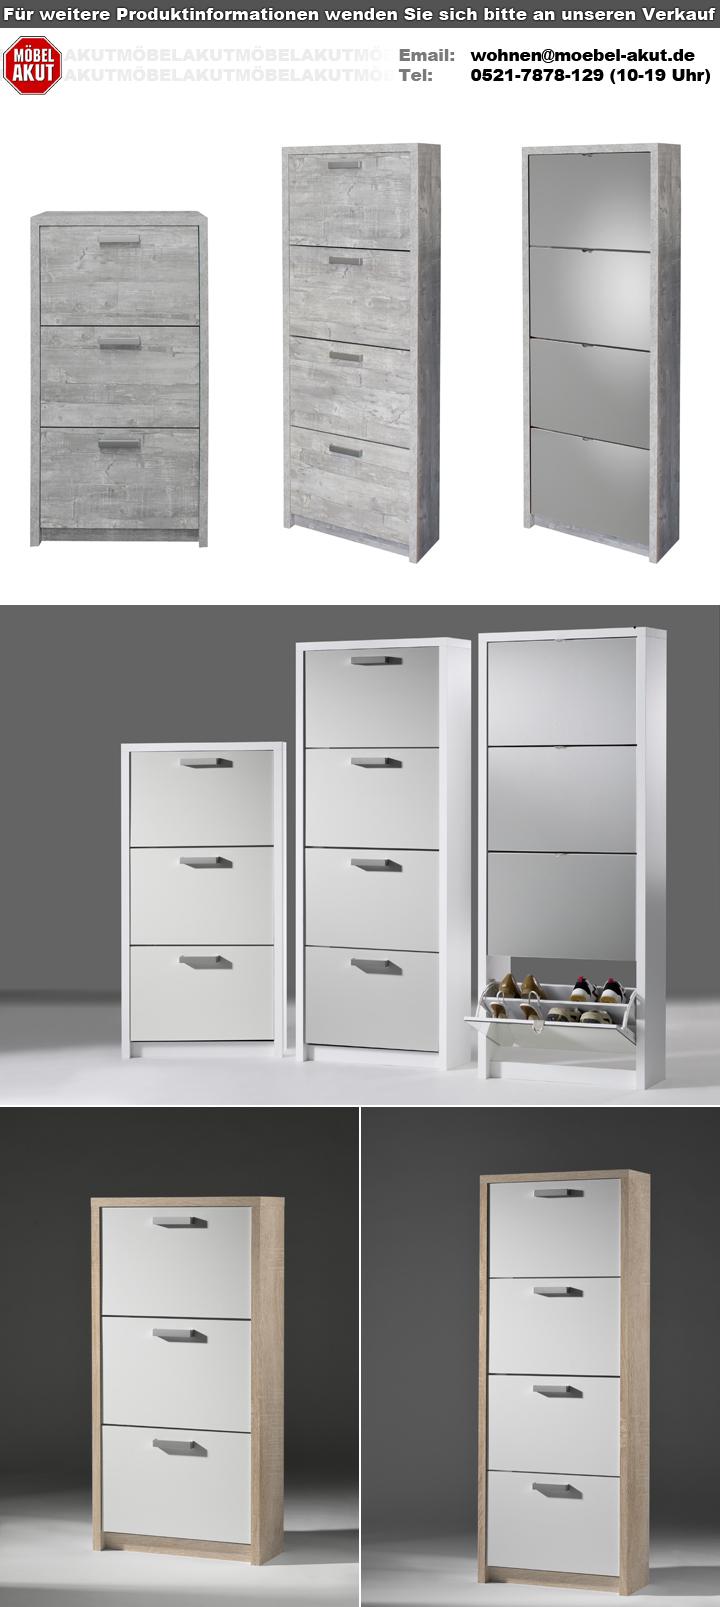 schuhkipper big in wei matt front spiegel mit 4 klappen f r 24 paar. Black Bedroom Furniture Sets. Home Design Ideas